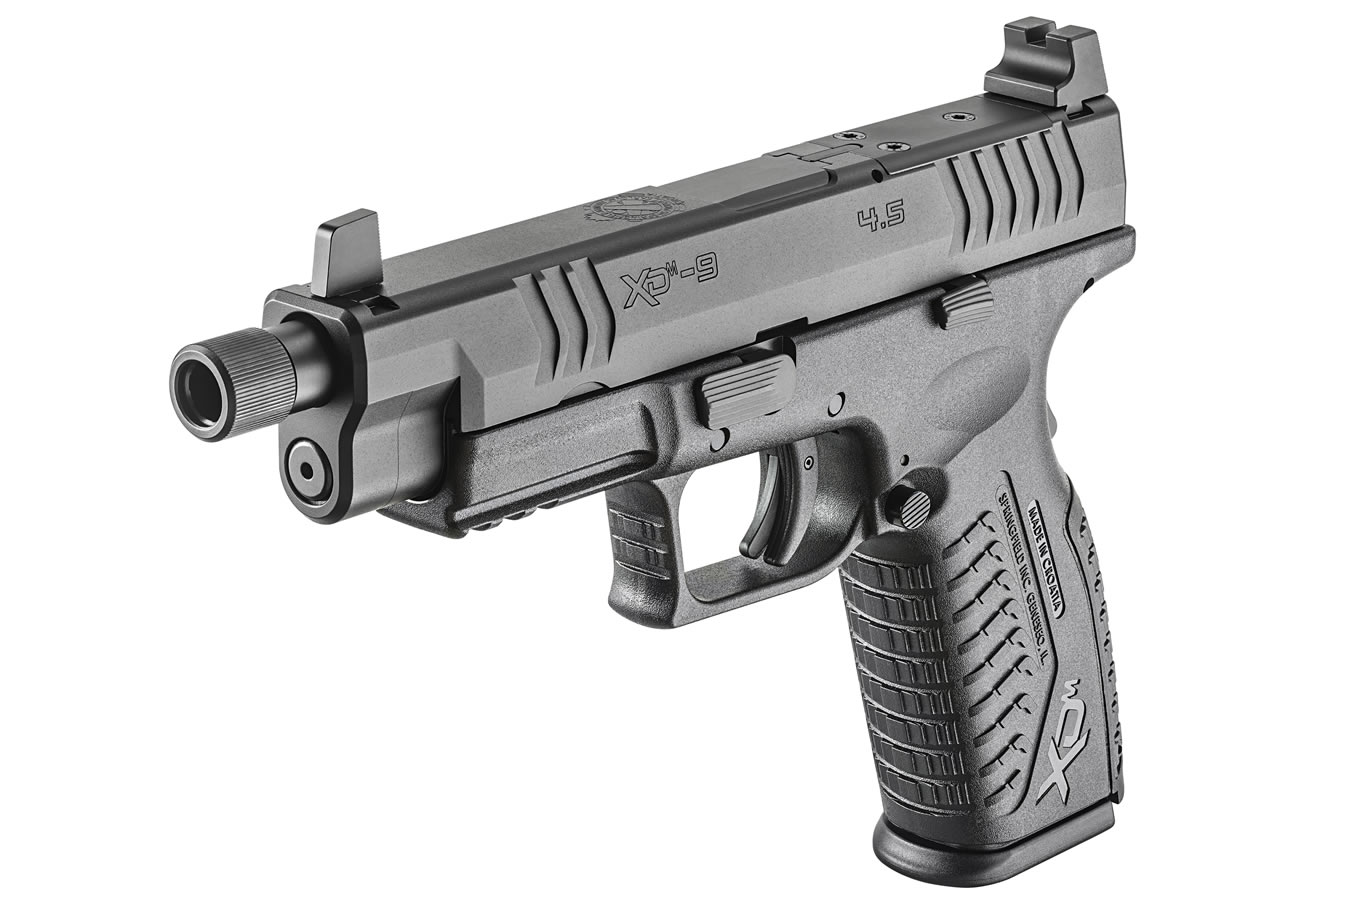 XDM OSP 9mm 4 5 Full-Size Optics-Ready Pistol with Threaded Barrel